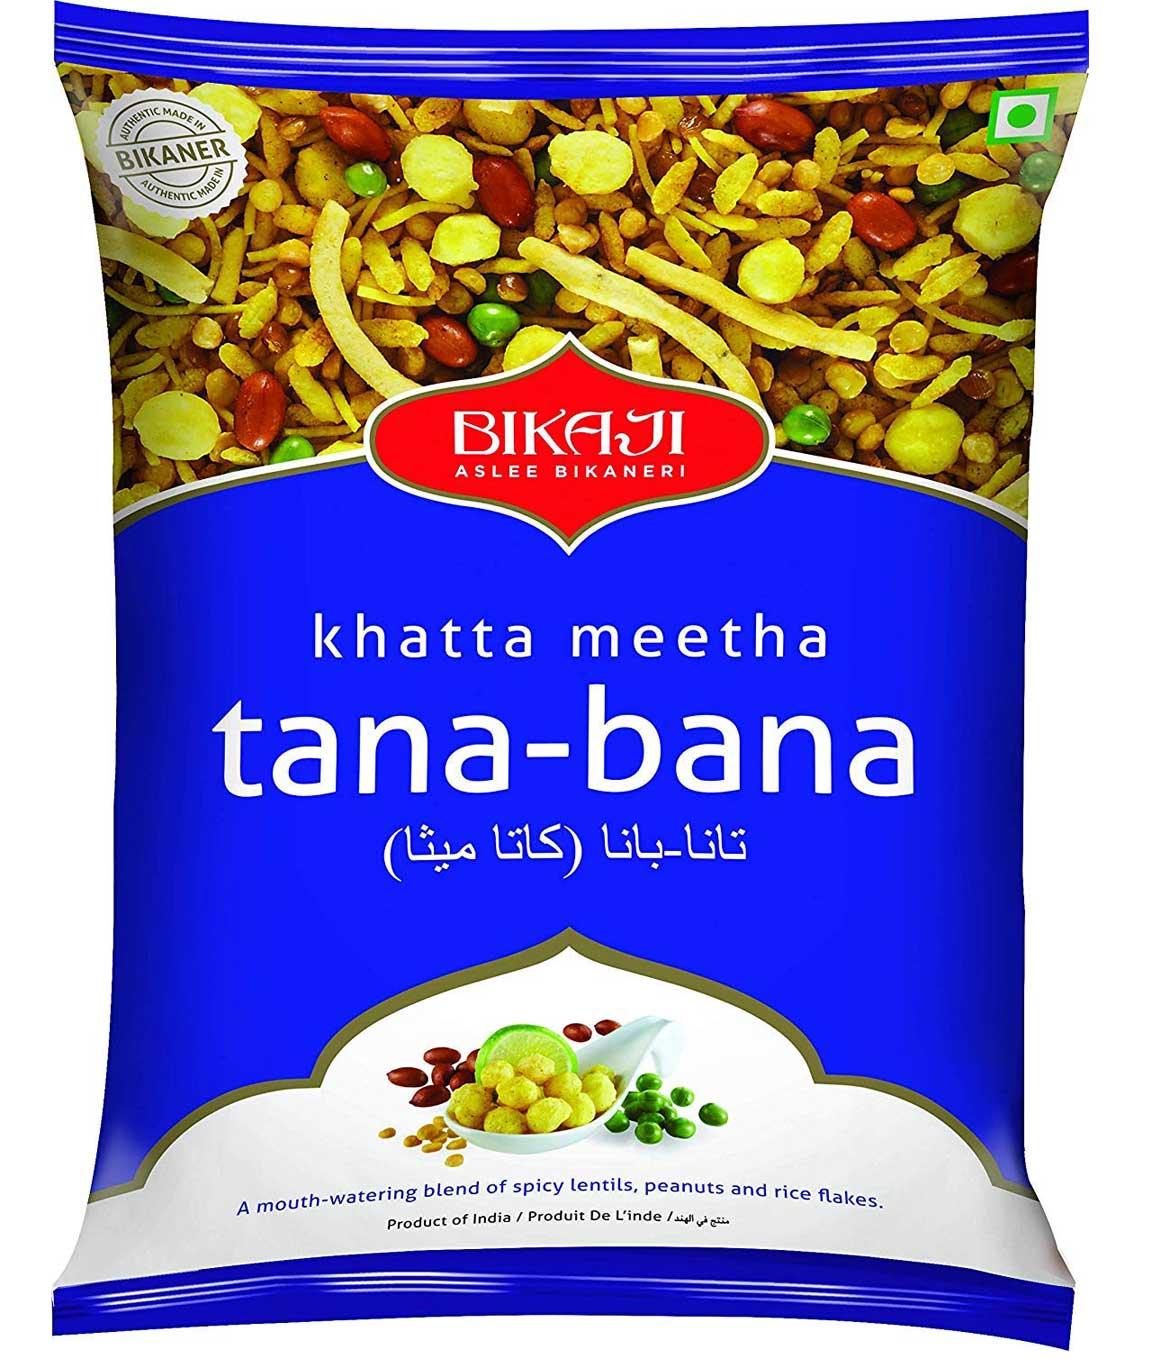 Bikaji Khatta Meetha tana-bana - Indian Neemkeen - Sweet and Spicy Mixture - 1 Kg Pack of 2 - Zip Lock Pack